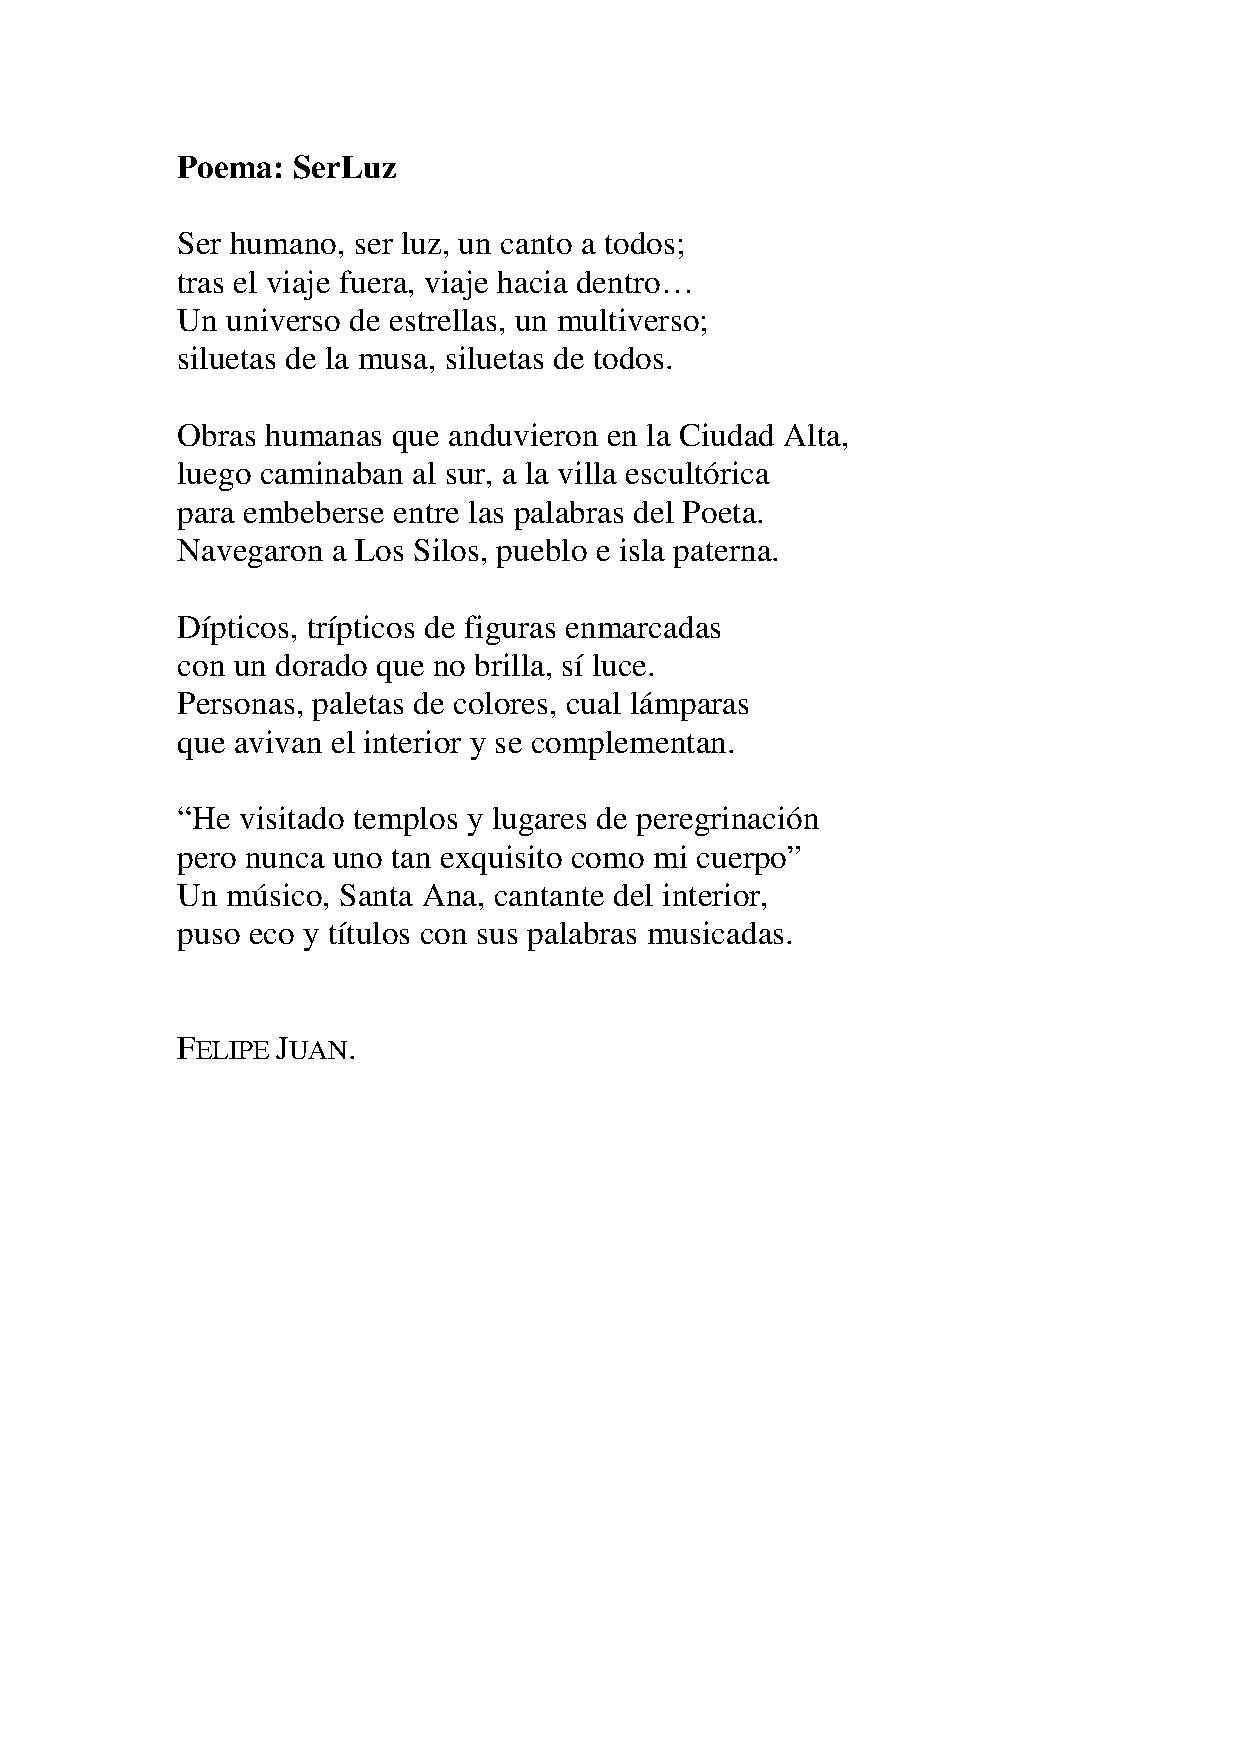 6_Exposición_serLuz__Poema_Felipe_Juan_.jpg